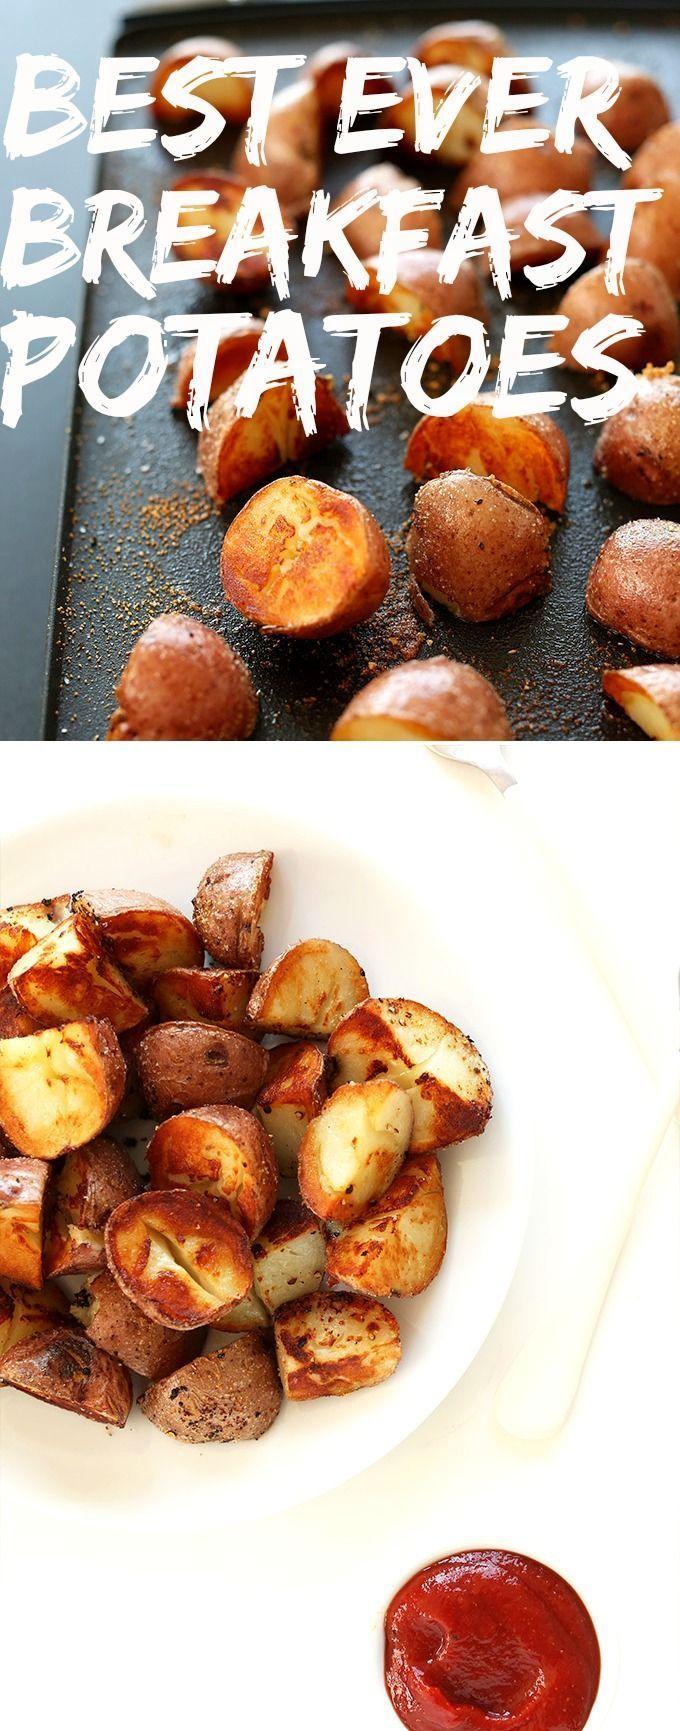 SUPER CRISPY Breakfast Potatoes thanks to one SIMPLE trick! #vegan #glutenfree